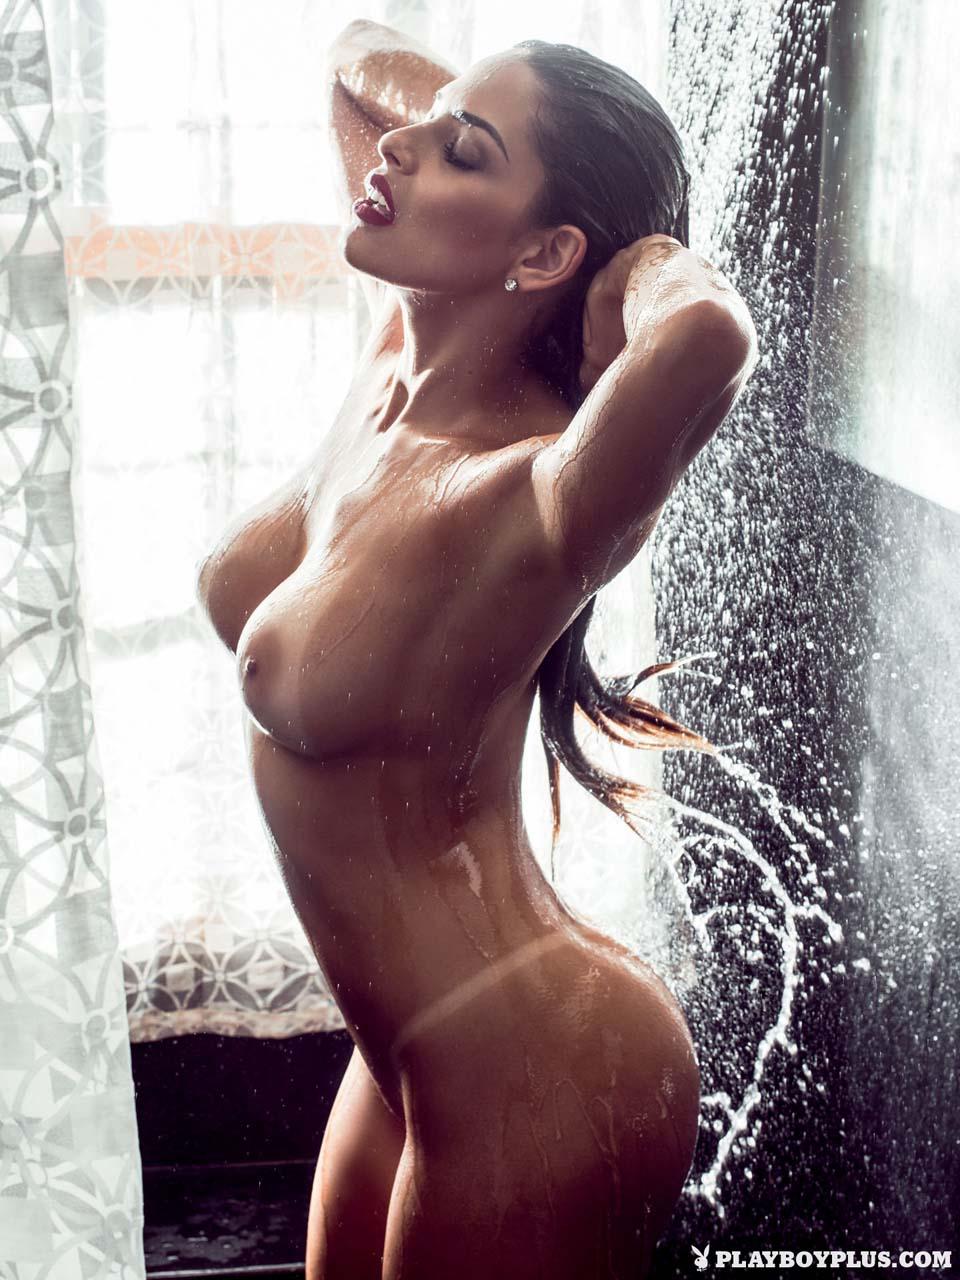 On nude posing kik women